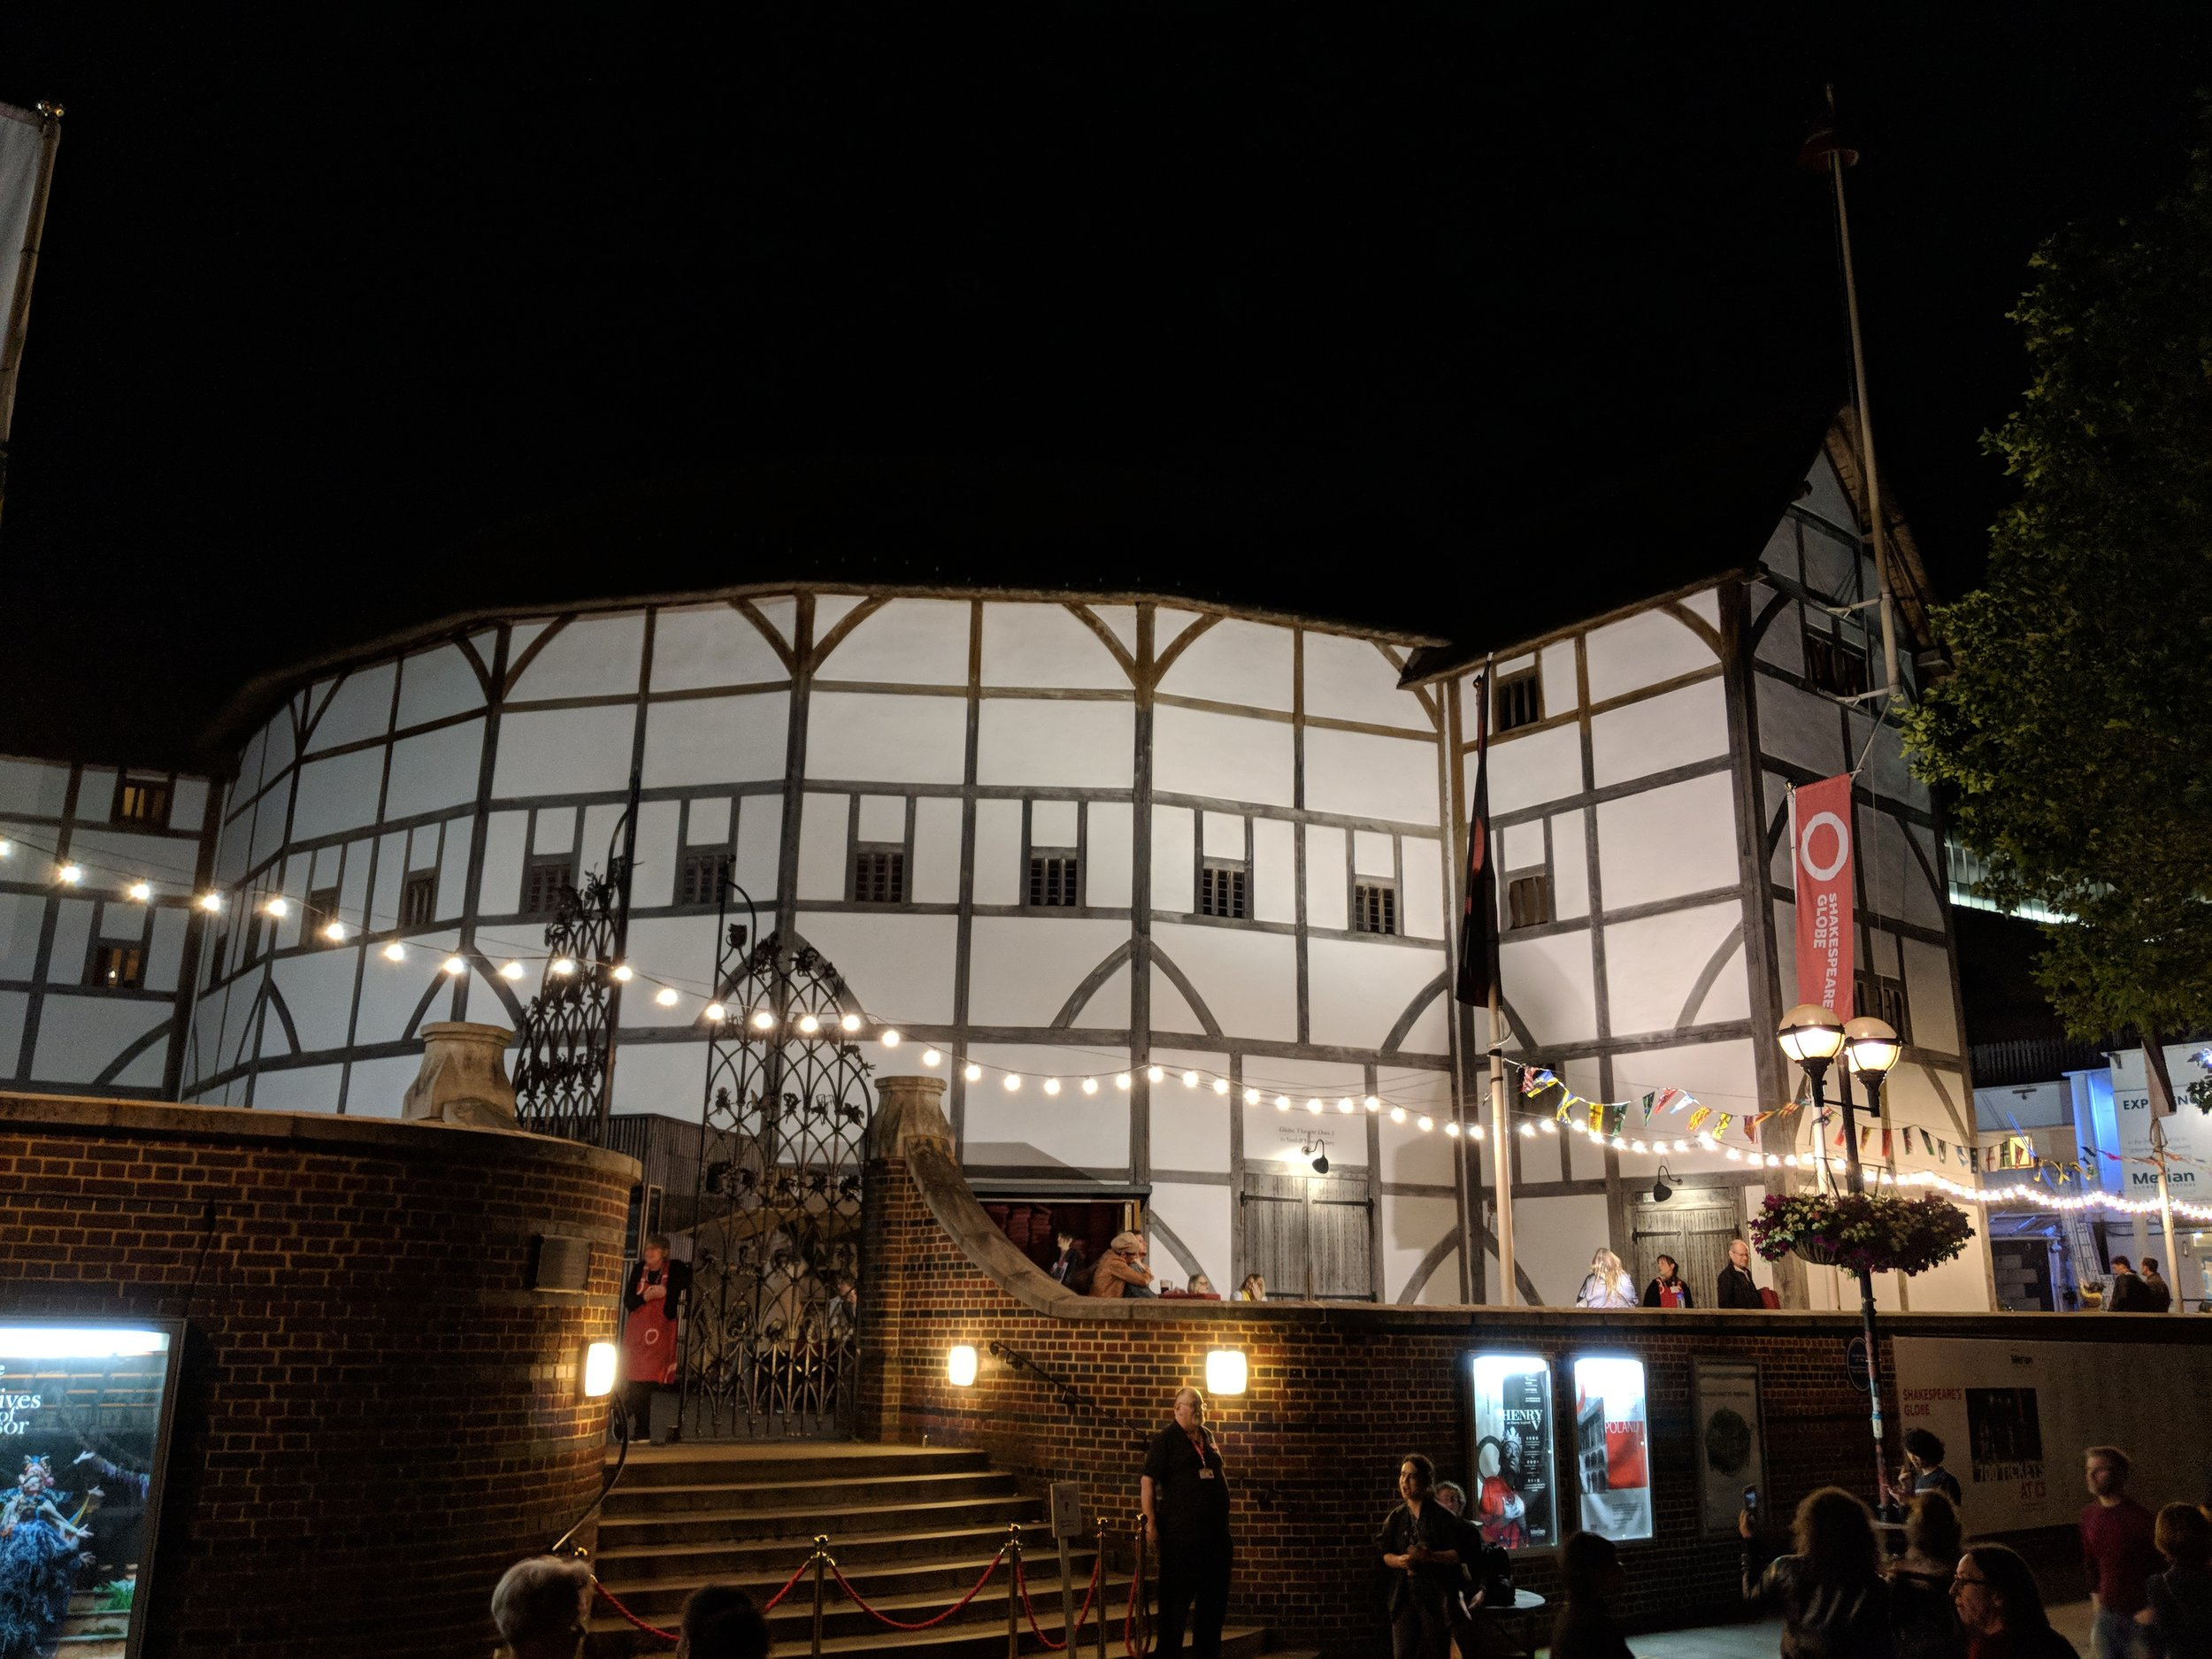 Shakespeare's Globe Theatre - visited 21/06/2019